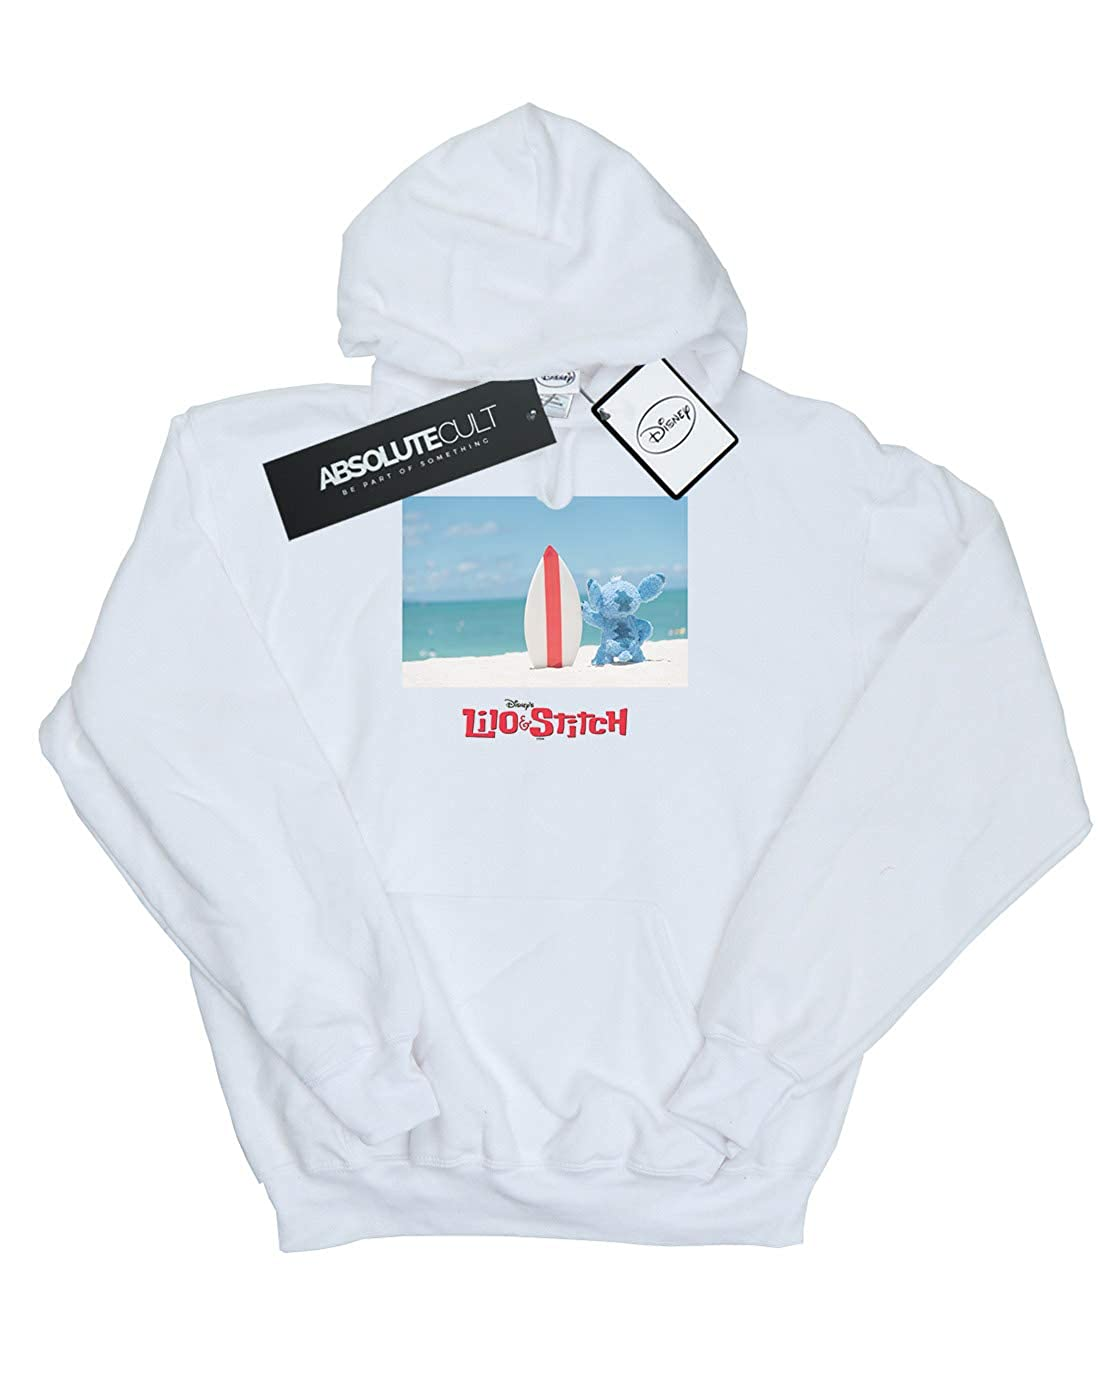 b7579728f8 Amazon.com: Disney Girls Lilo & Stitch Surf Beach Hoodie: Clothing